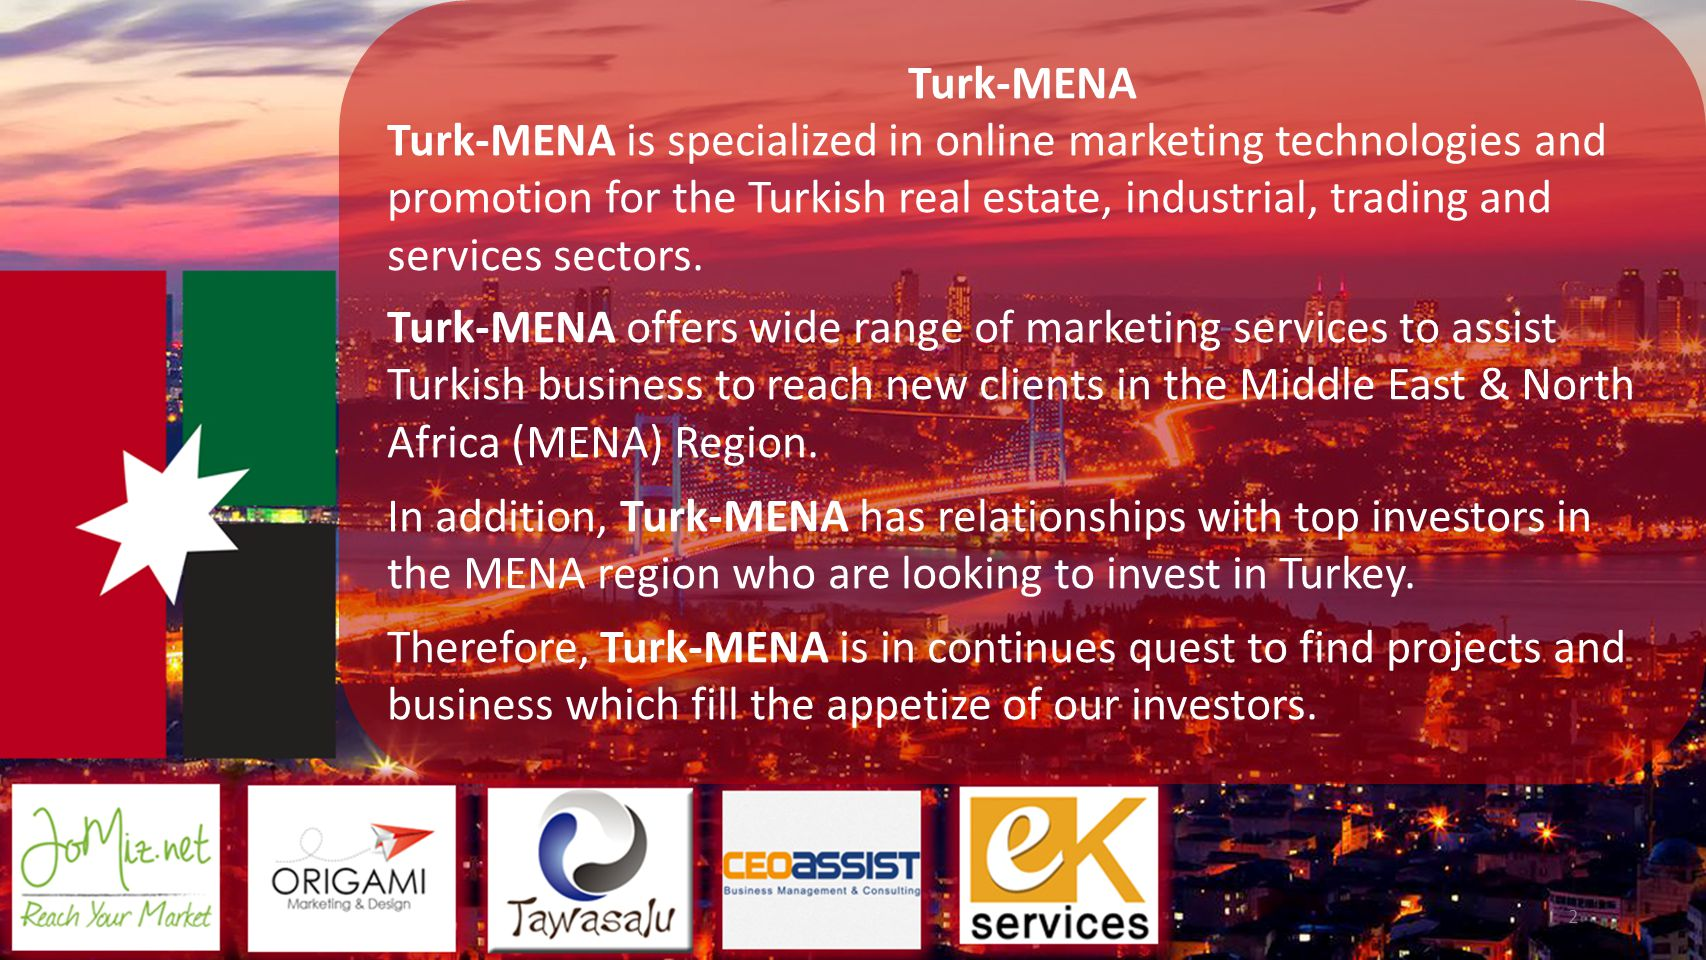 Turk-MENA